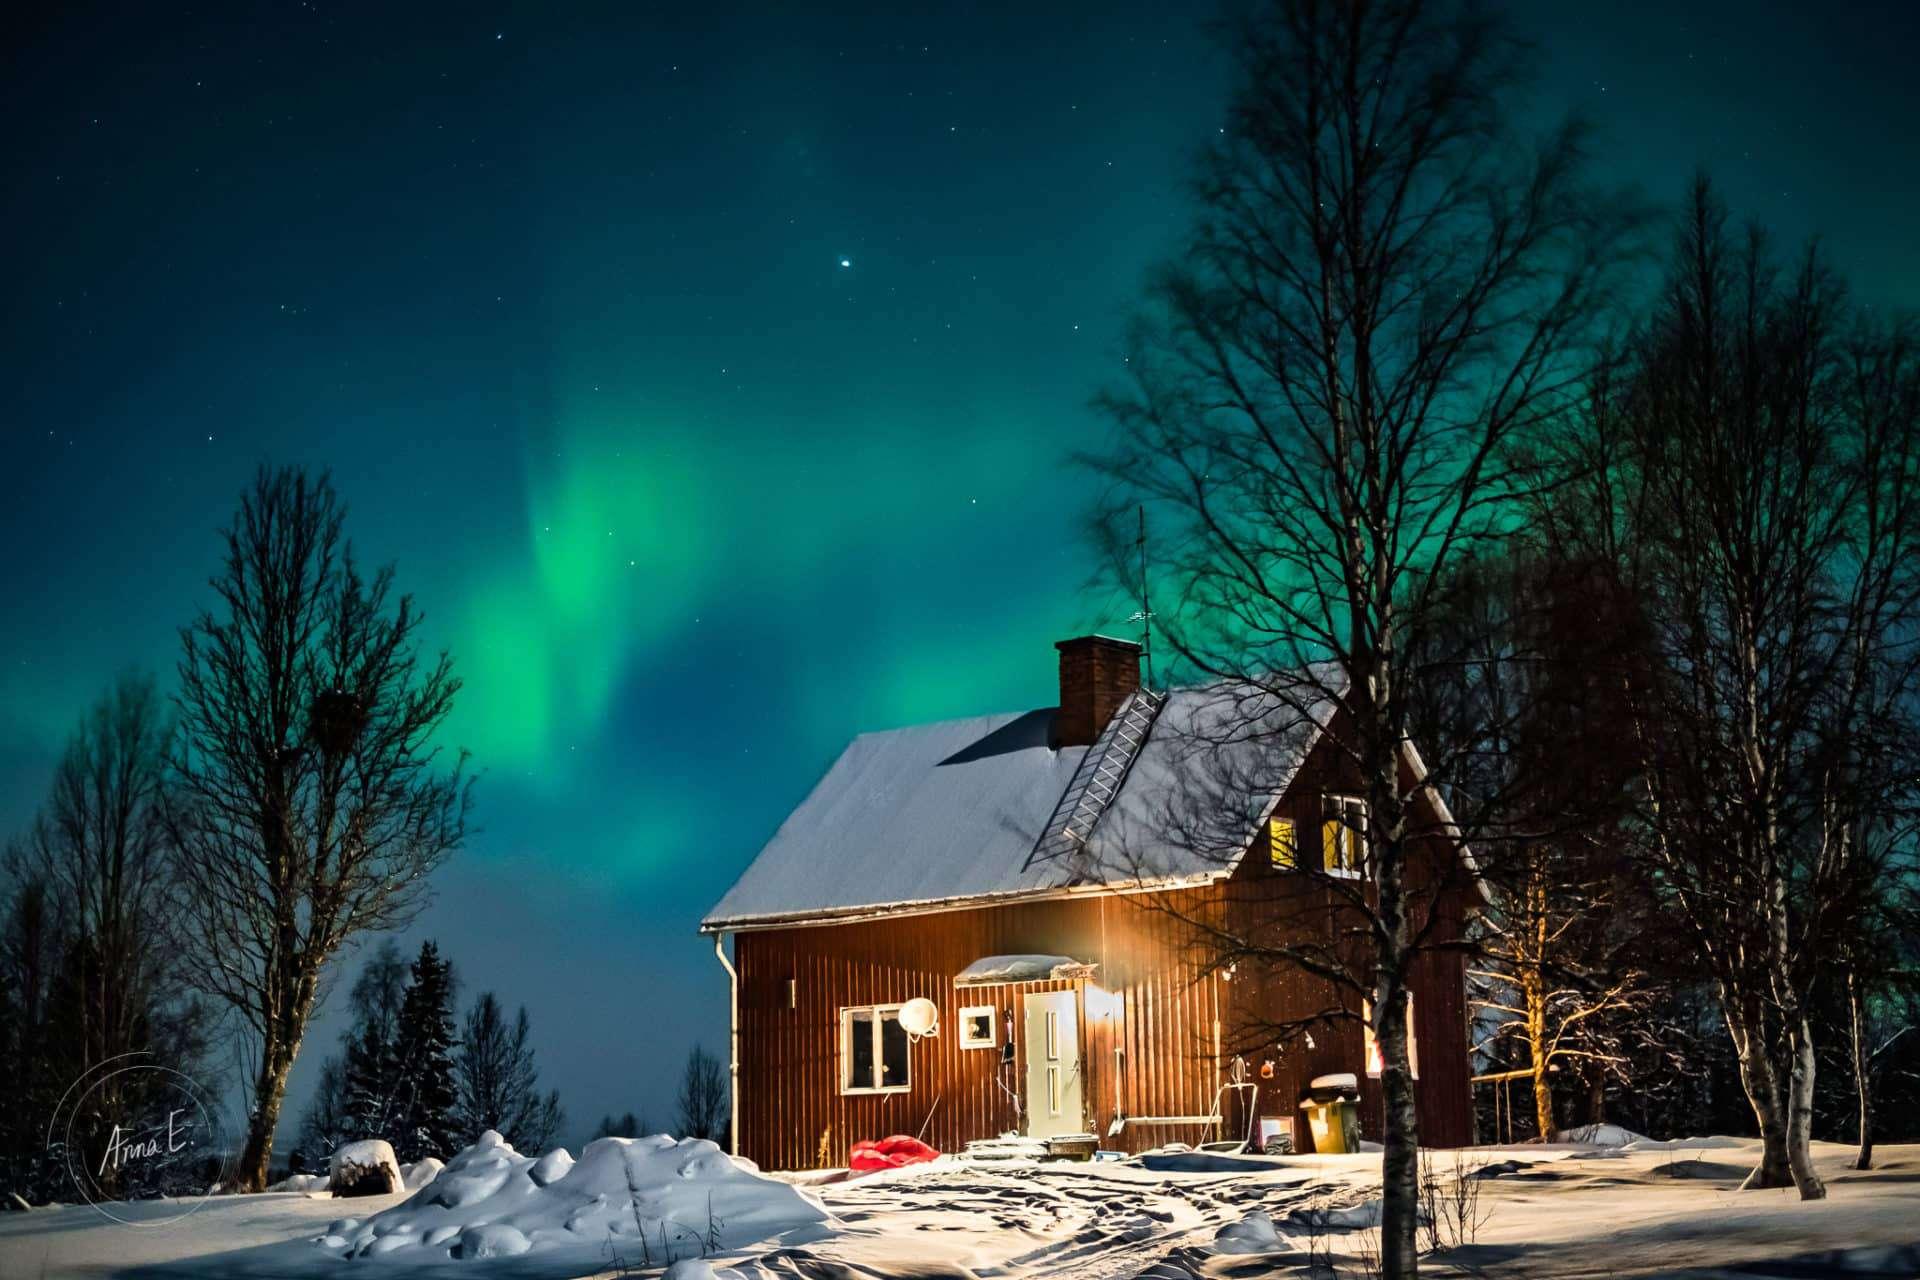 En månskensbelyst röd stuga i snön med norrsken - fotografera norrsken